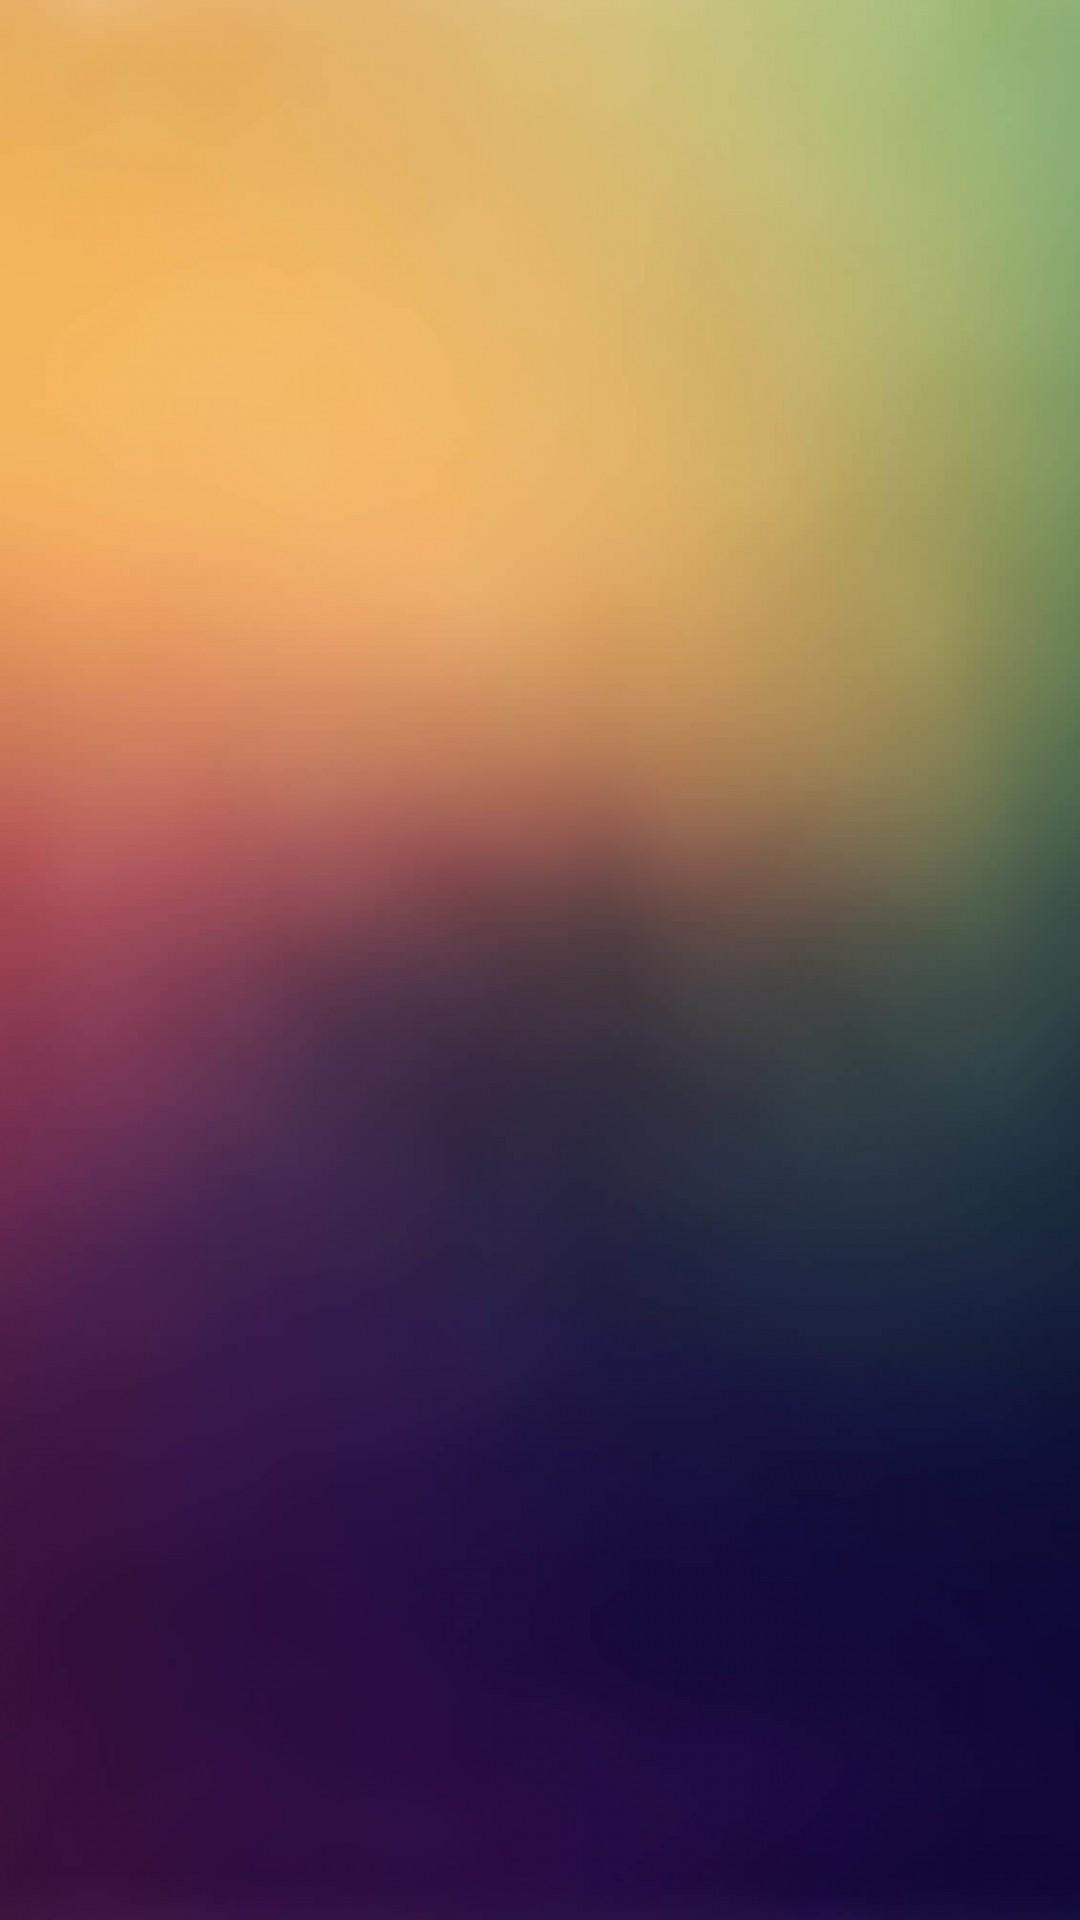 https://www.hdwallpapers.net/images/blurred-rainbow-wallpaper-for-galaxy-s4-95-817.jpg